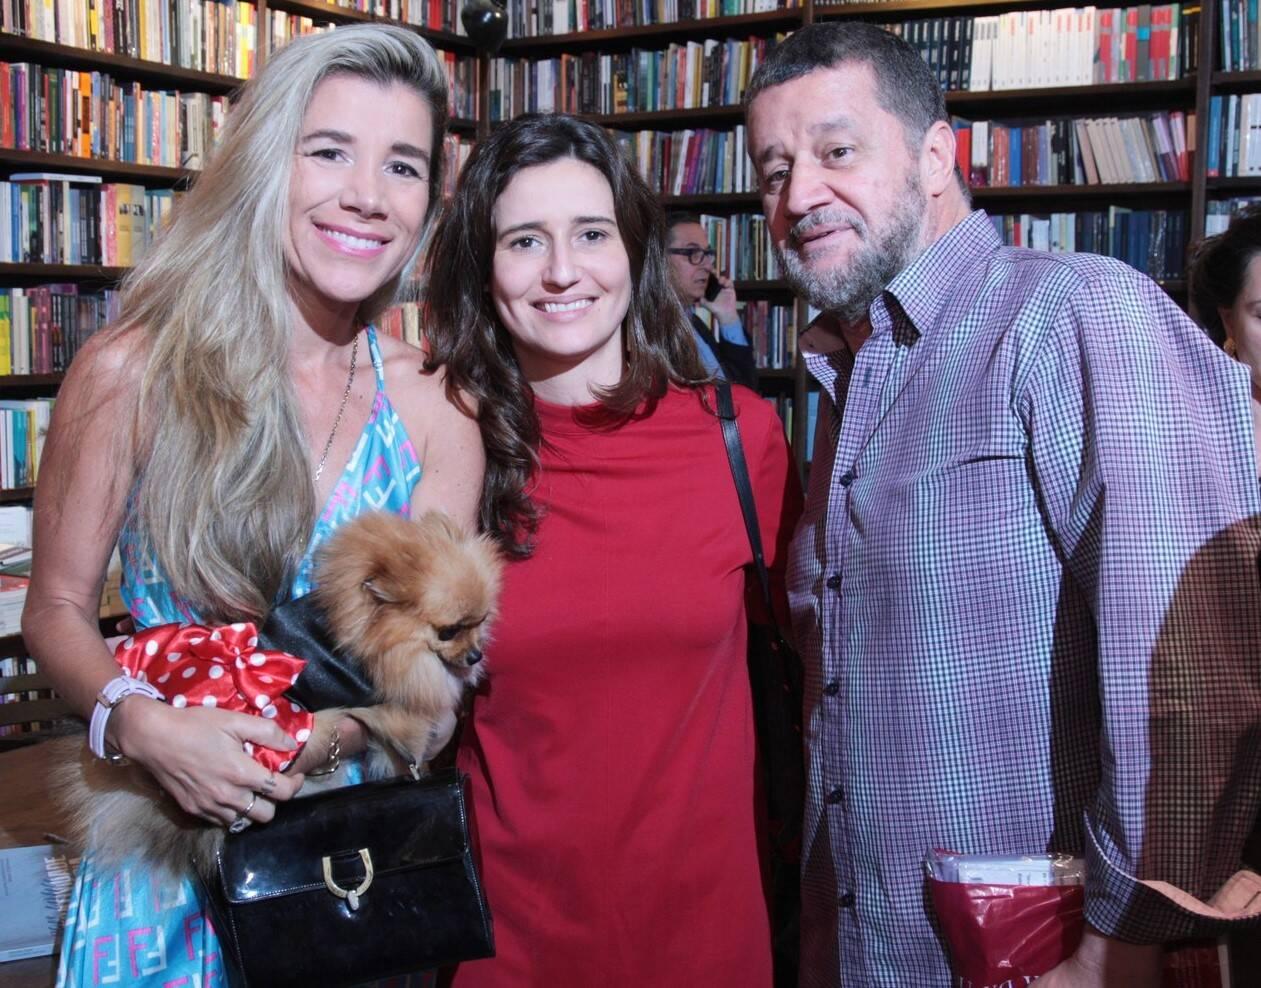 Marianna Tamborindeguy de Oliveira entre Fernanda Capobianco e Wlater Guimarães /Foto: Vera Donato